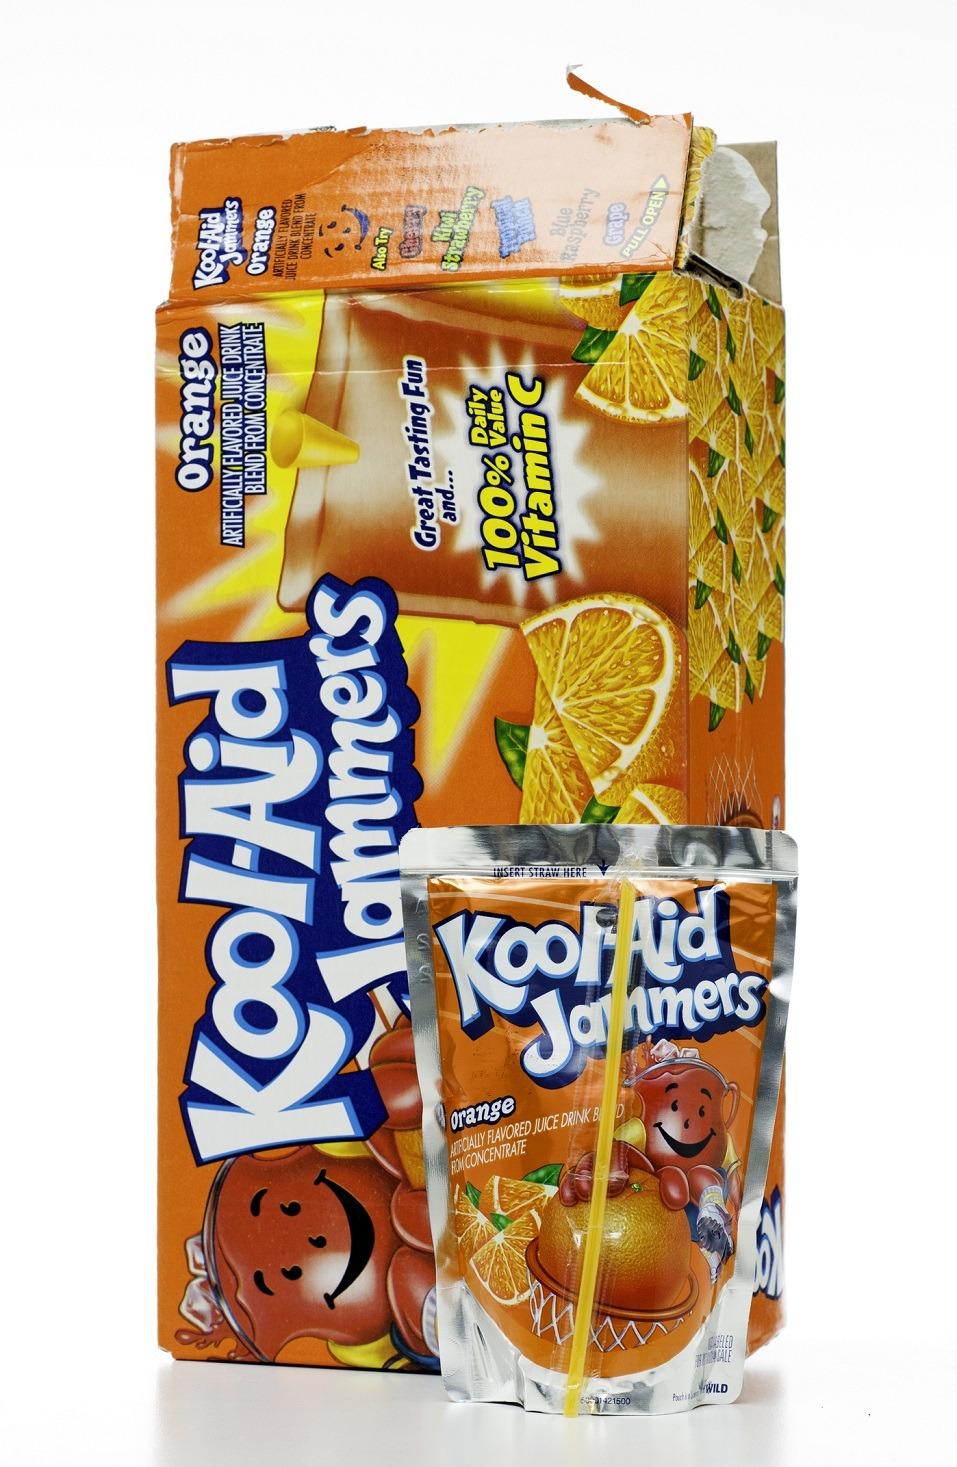 An opened box of orange flavored Kool-Aid Jammers